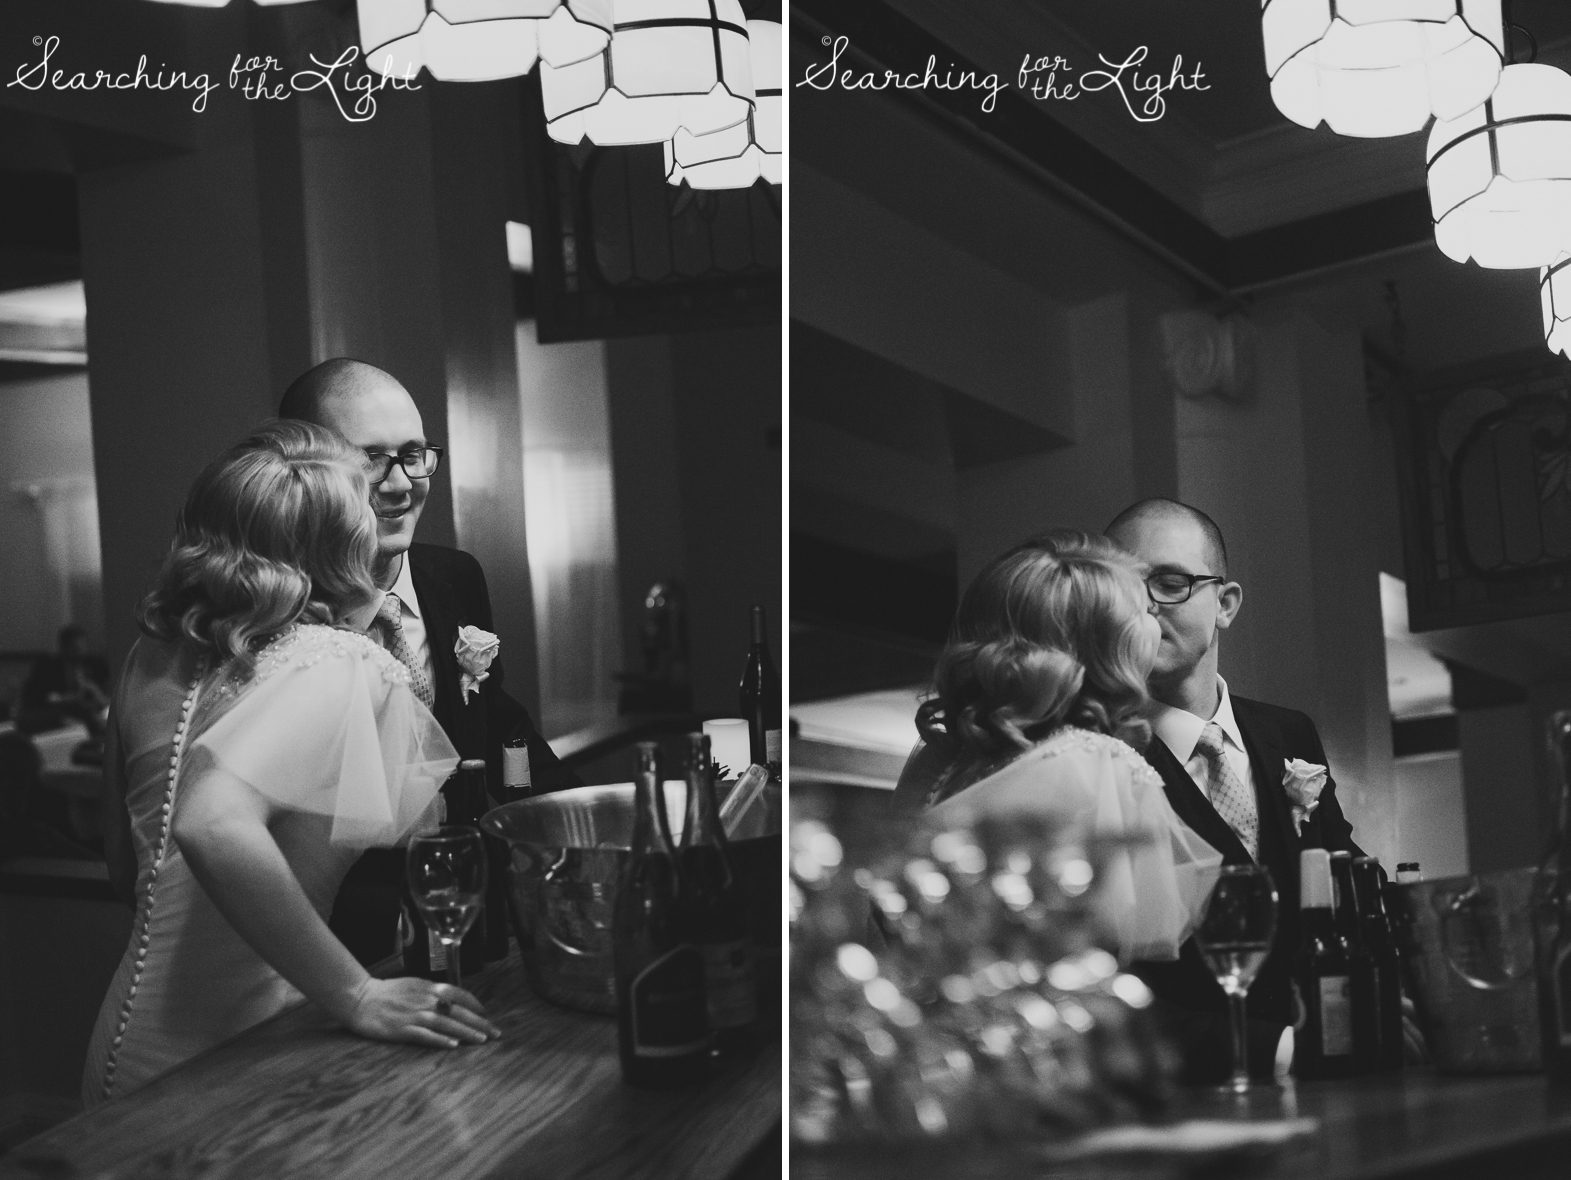 Romantic wedding photos at the bar Parkside mansion wedding photo by denver wedding photographer, romantic evening wedding photo, city wedding